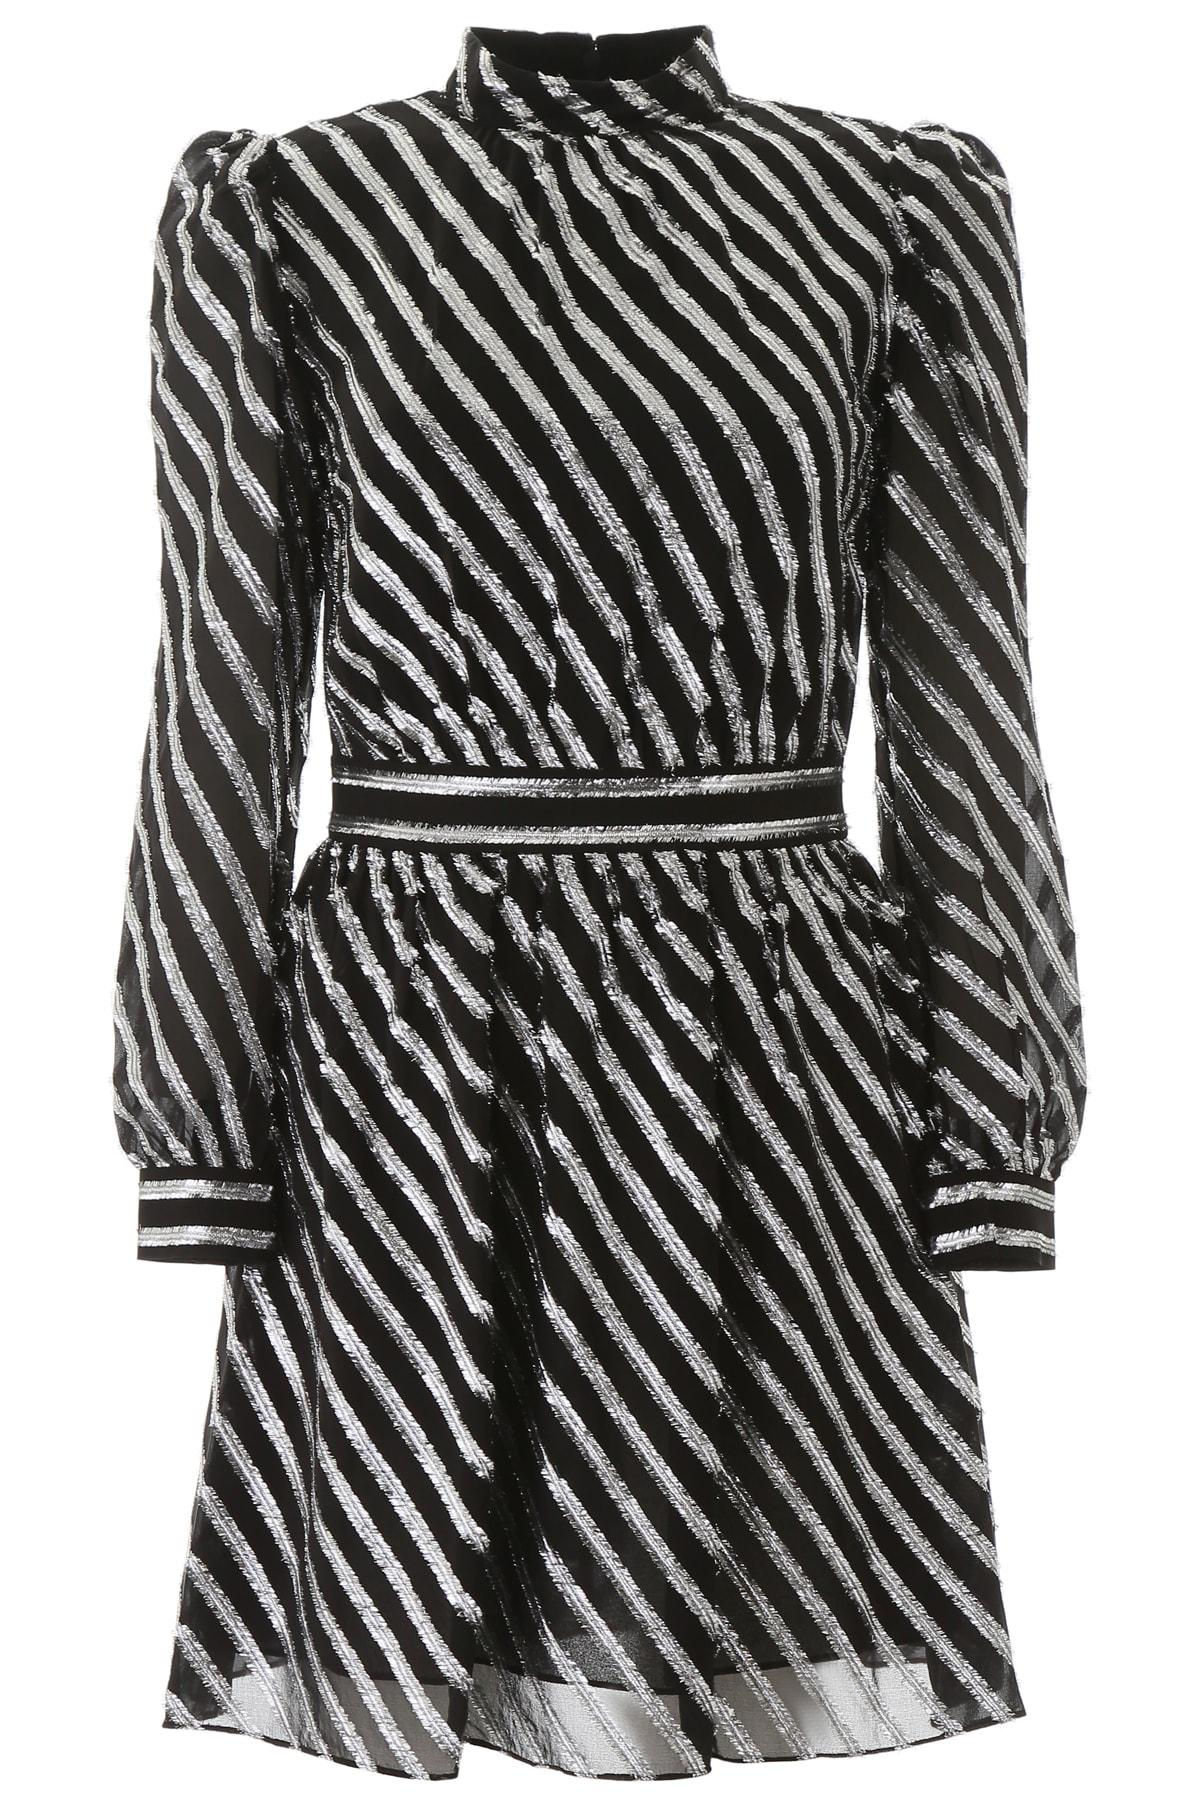 Buy MICHAEL Michael Kors Lurex Striped Mini Dress online, shop MICHAEL Michael Kors with free shipping